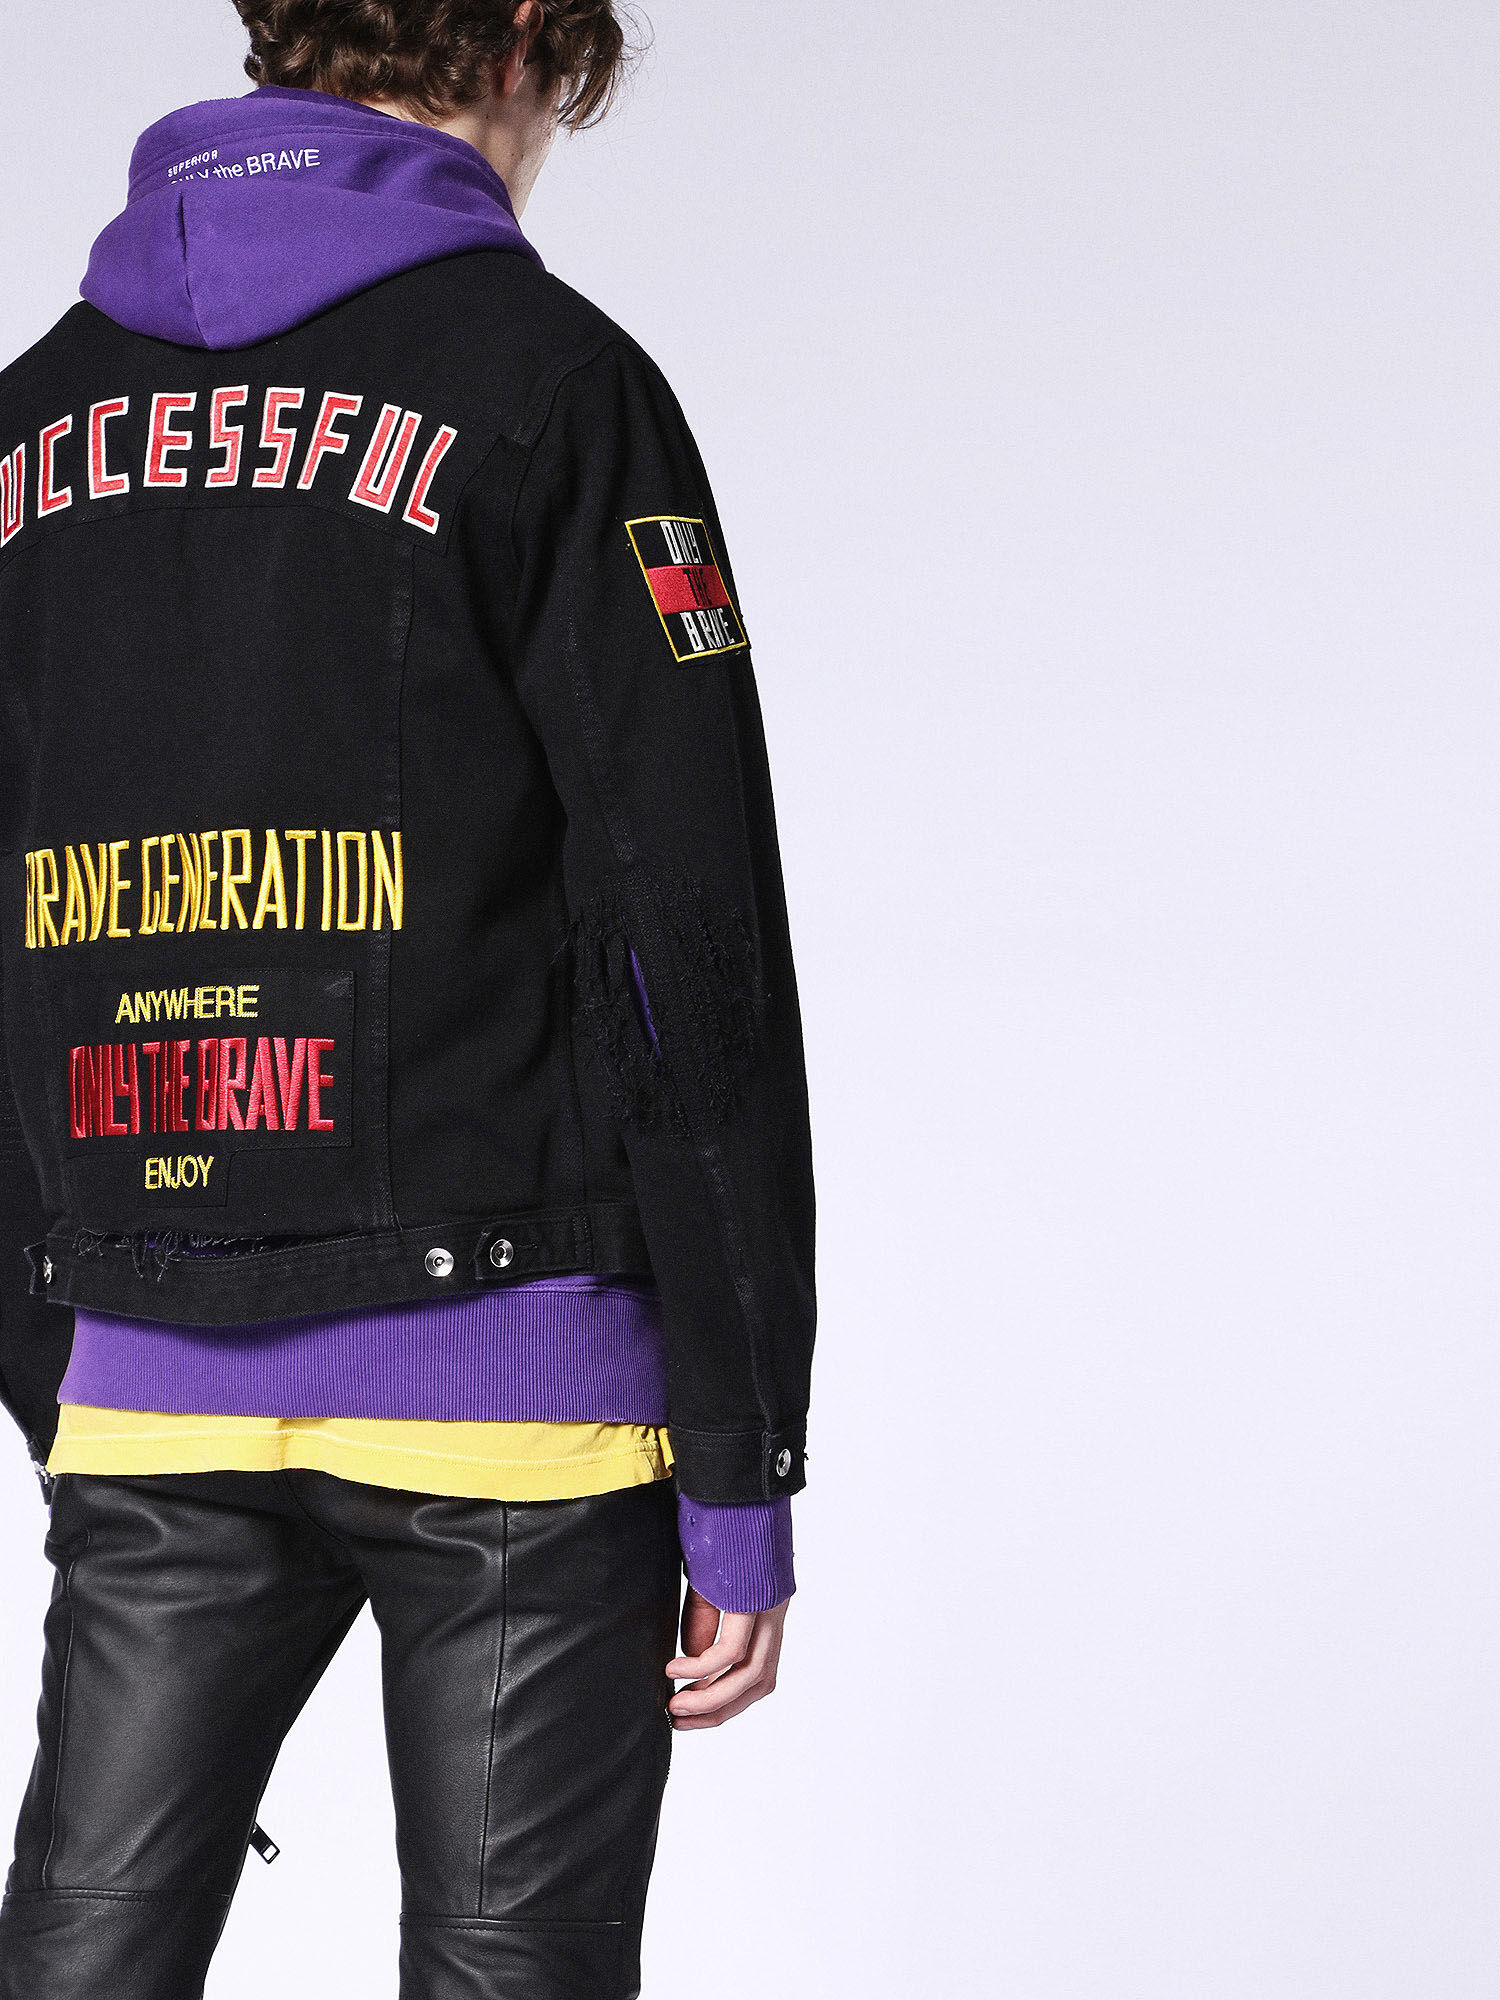 D generation jacket